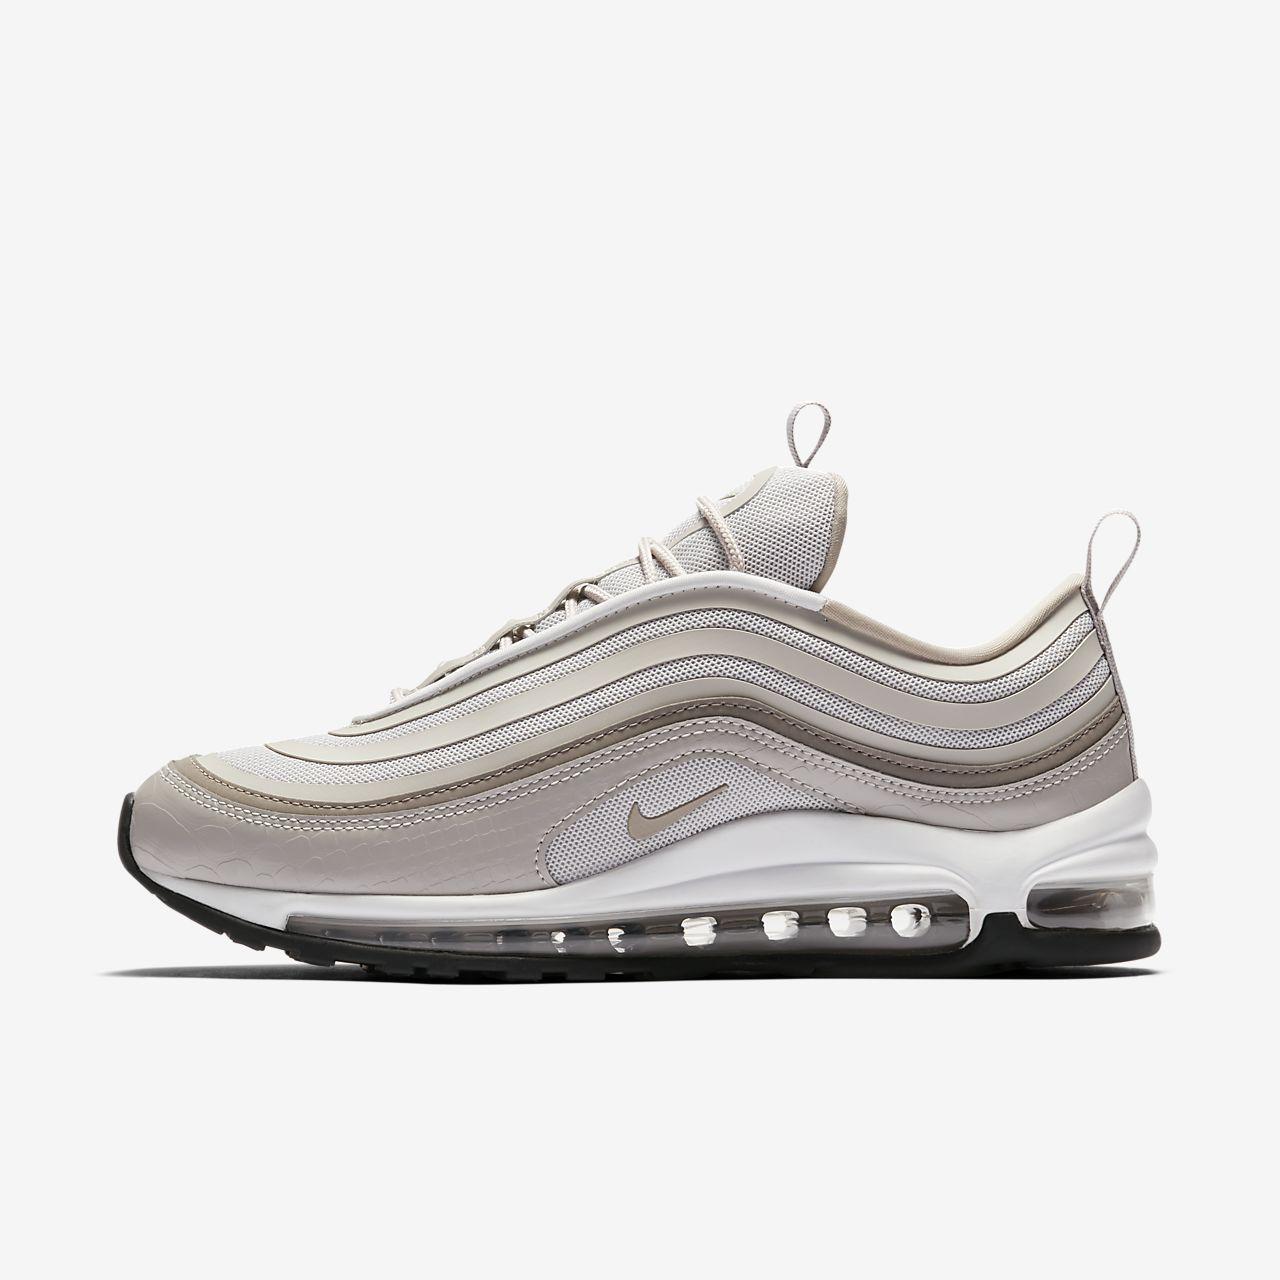 scarpa nike air max 97 donna